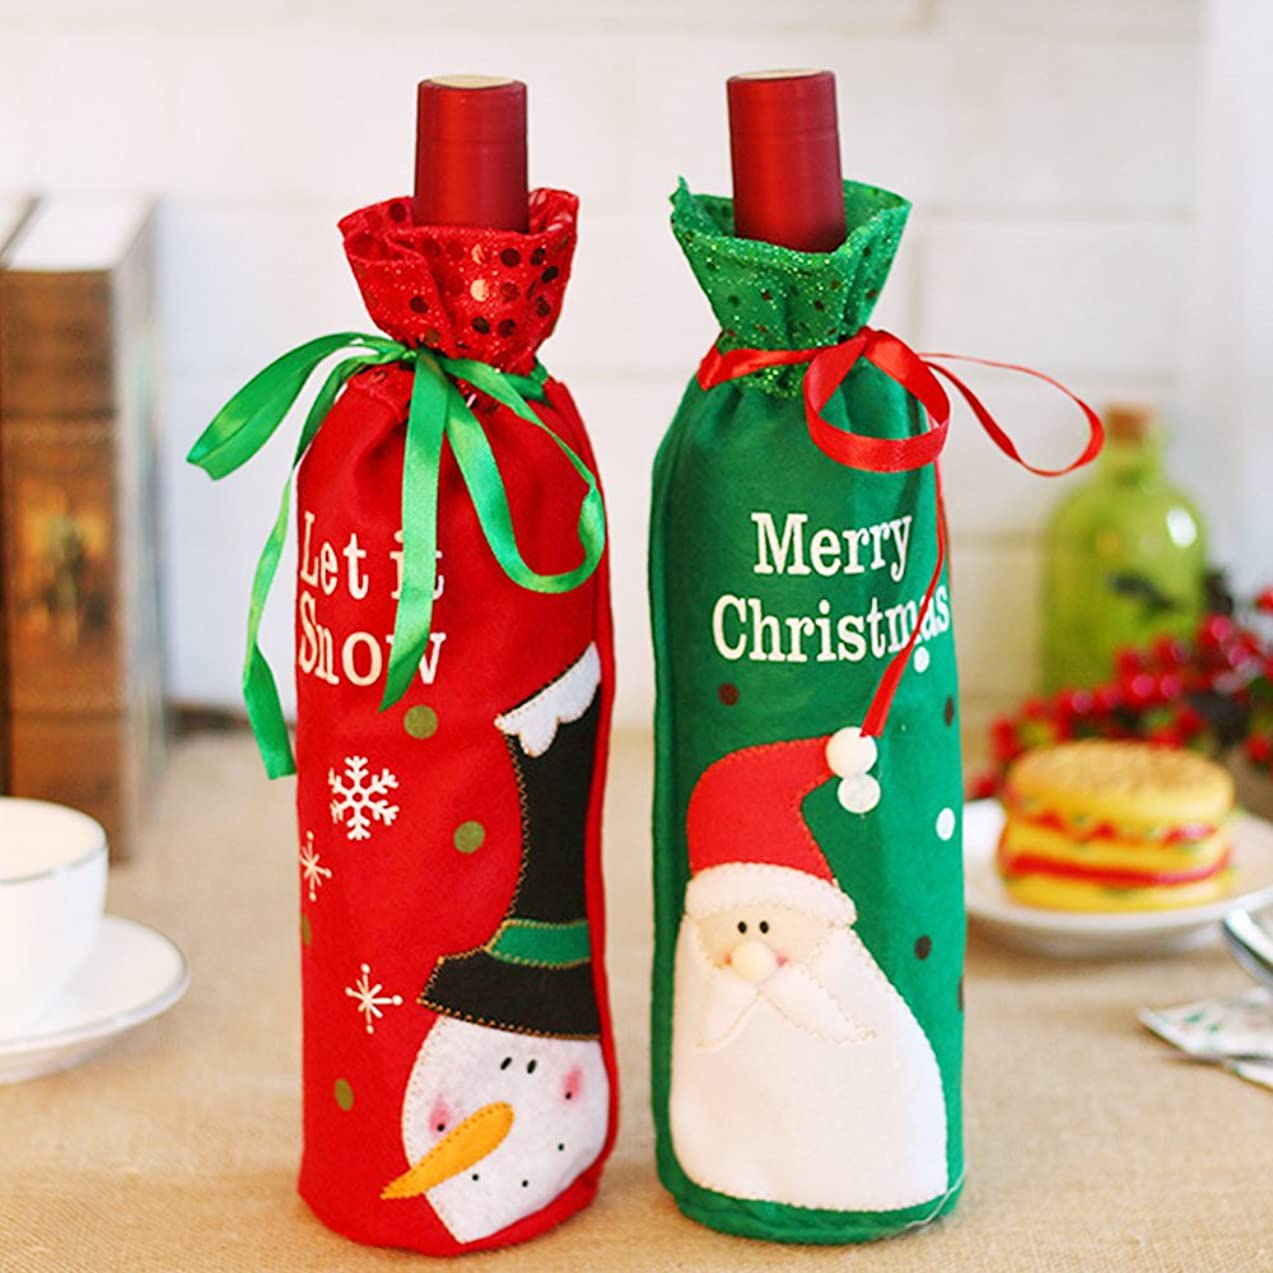 ElementDigital Christmas Wine Bottle Bags Wine Bottle Gift Bags Wine Bottle Xmas Gifts Wine Bag Wine Bottle Cover Bottle Gift Bag Wine Gift Bag Wine Bottle Bag Home Party Decoration